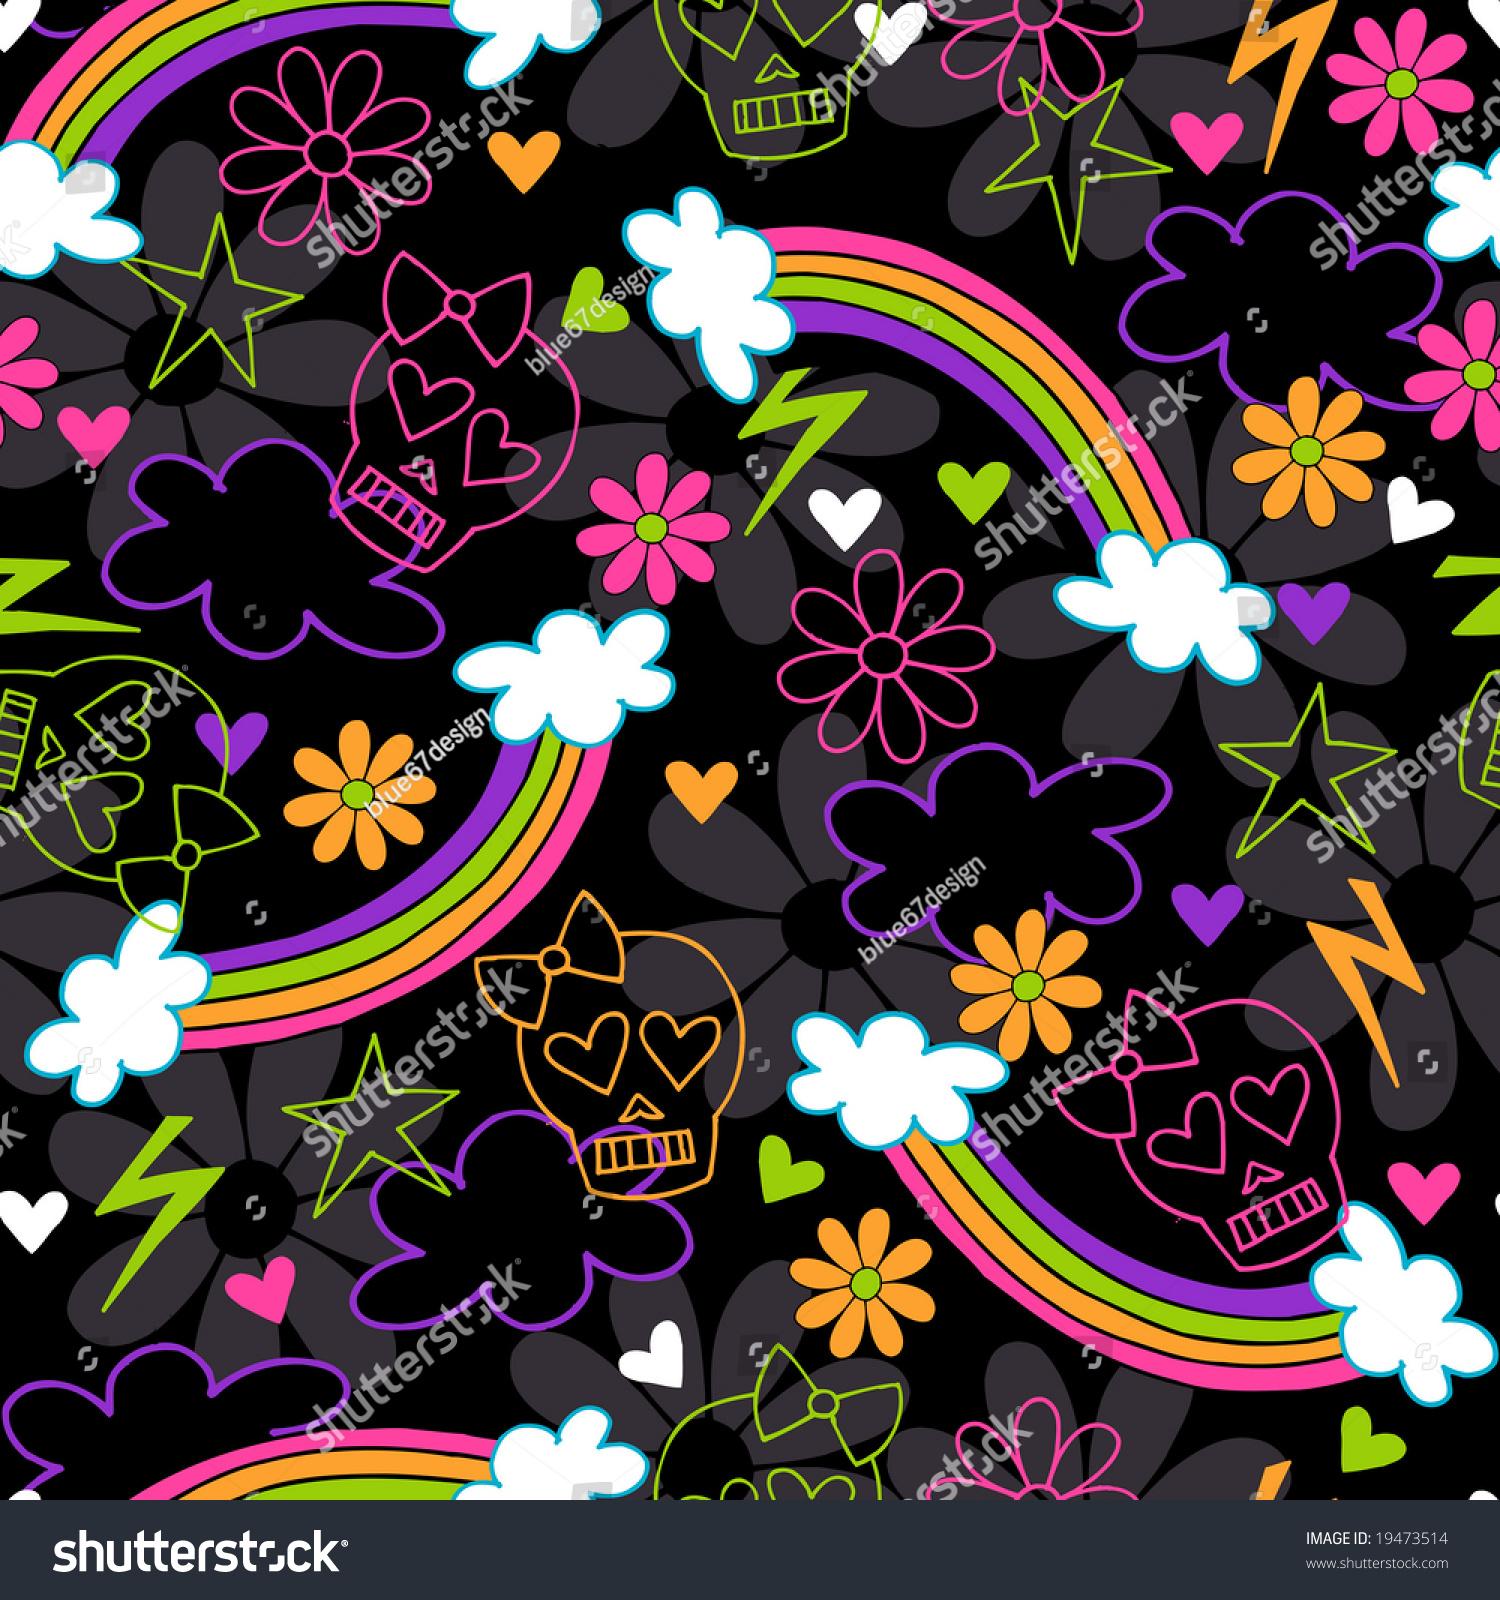 Punk Wallpaper: Girly Punk Skulls Rainbows Seamless Repeat Stock Vector